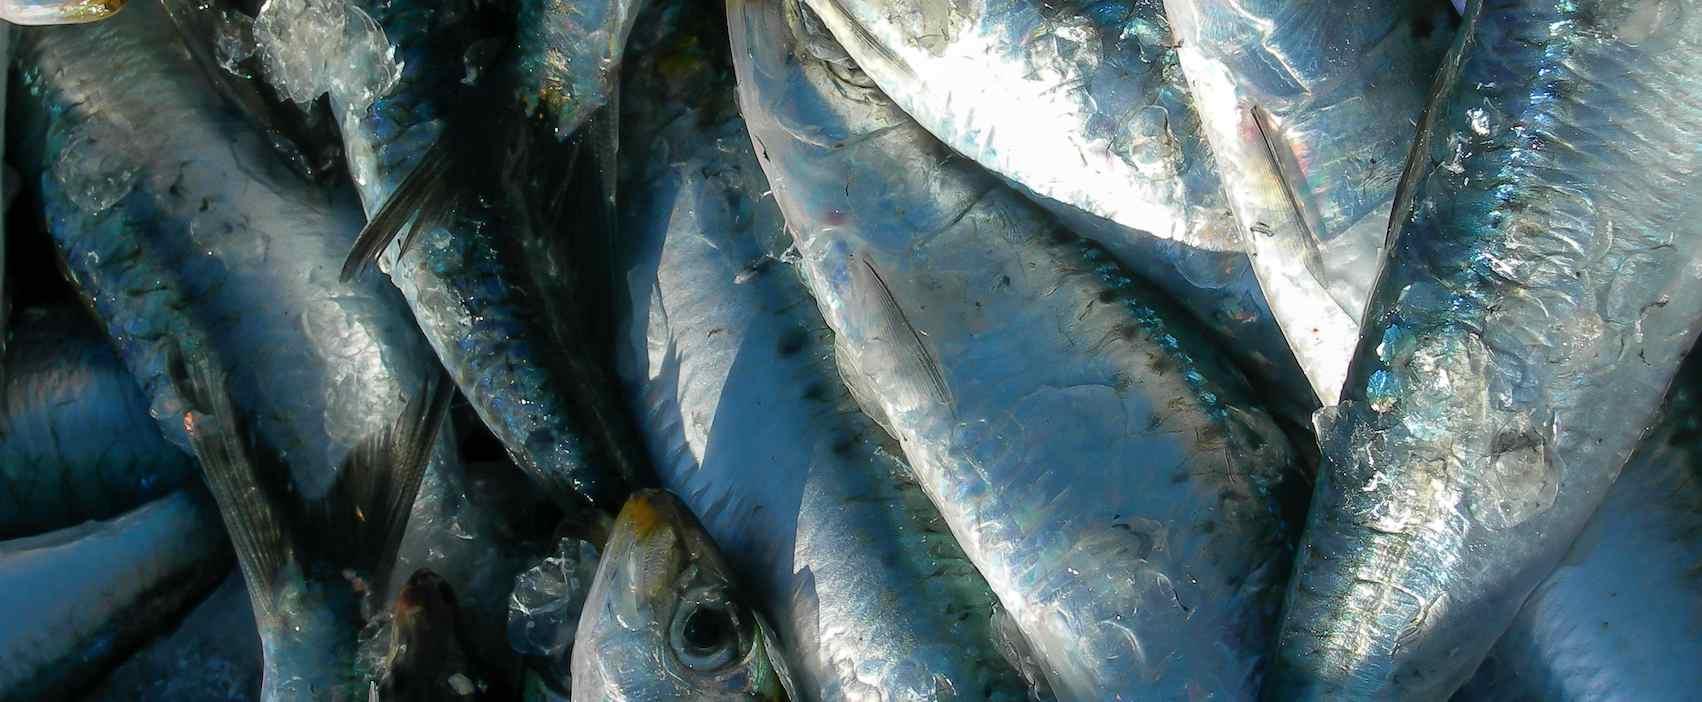 Bar et sardine